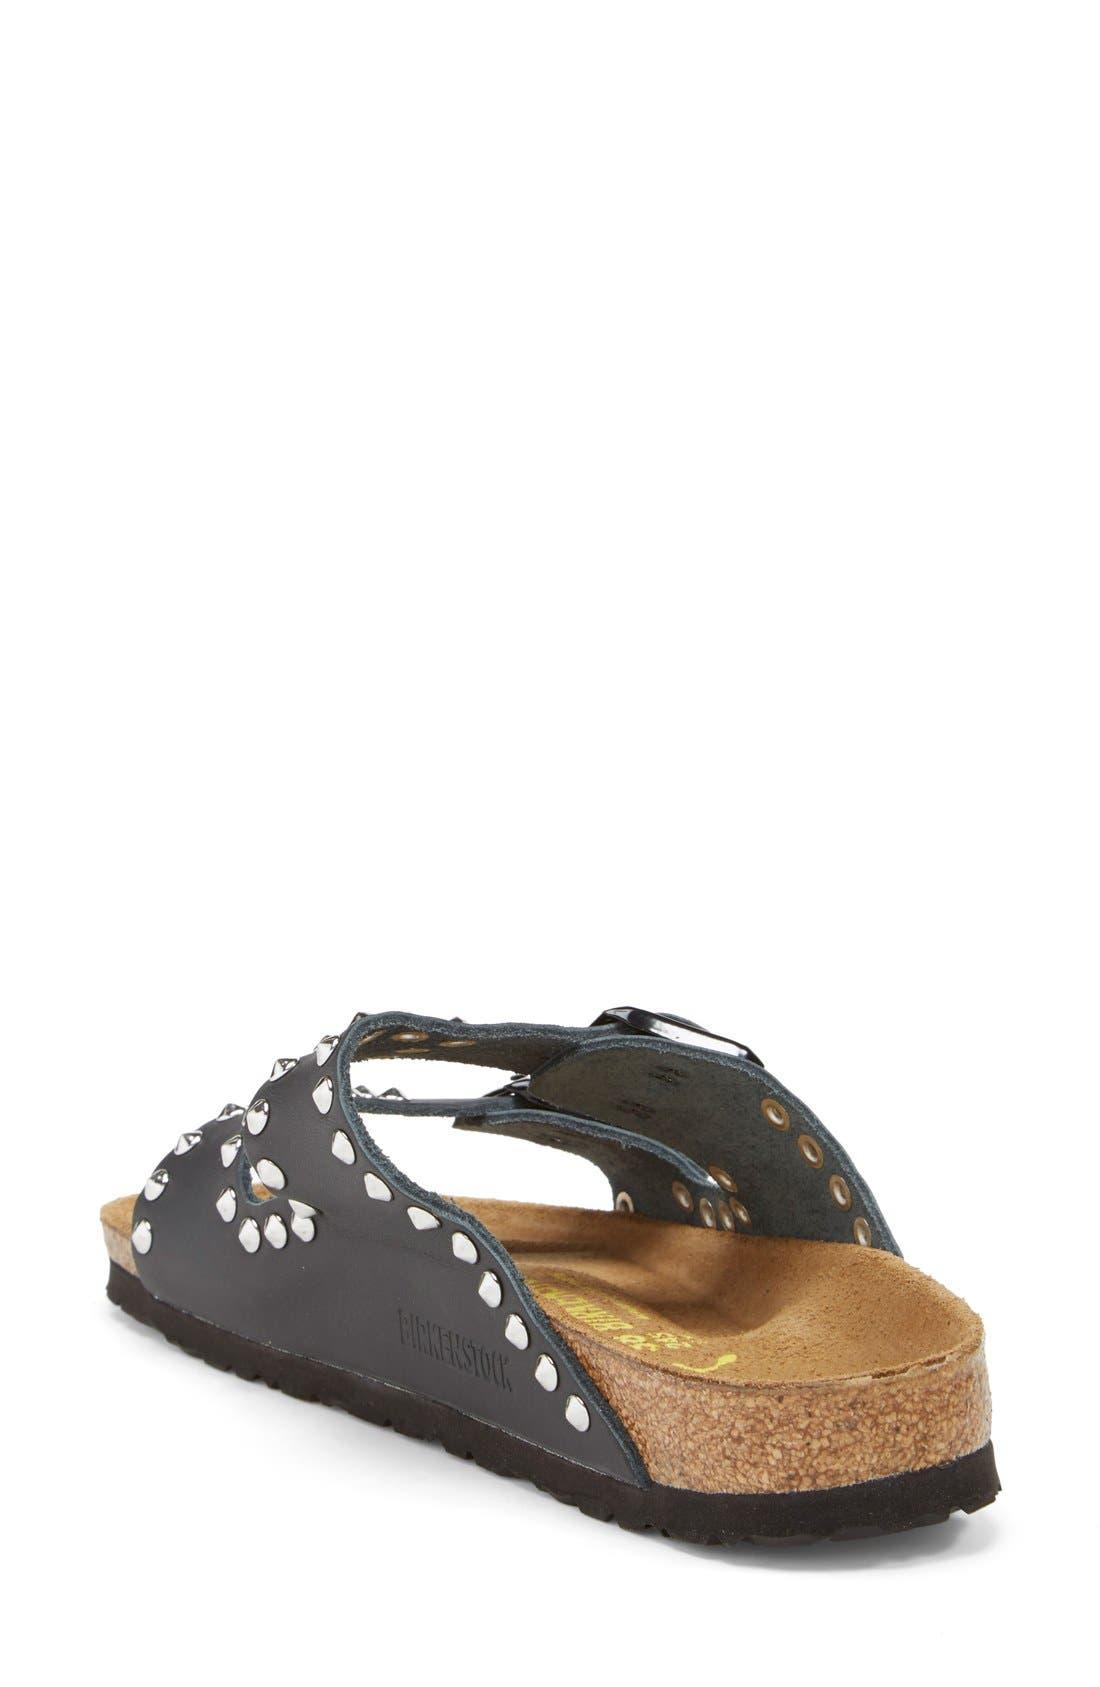 Alternate Image 2  - Birkenstock 'Arizona' Studded Leather Sandal (Women)